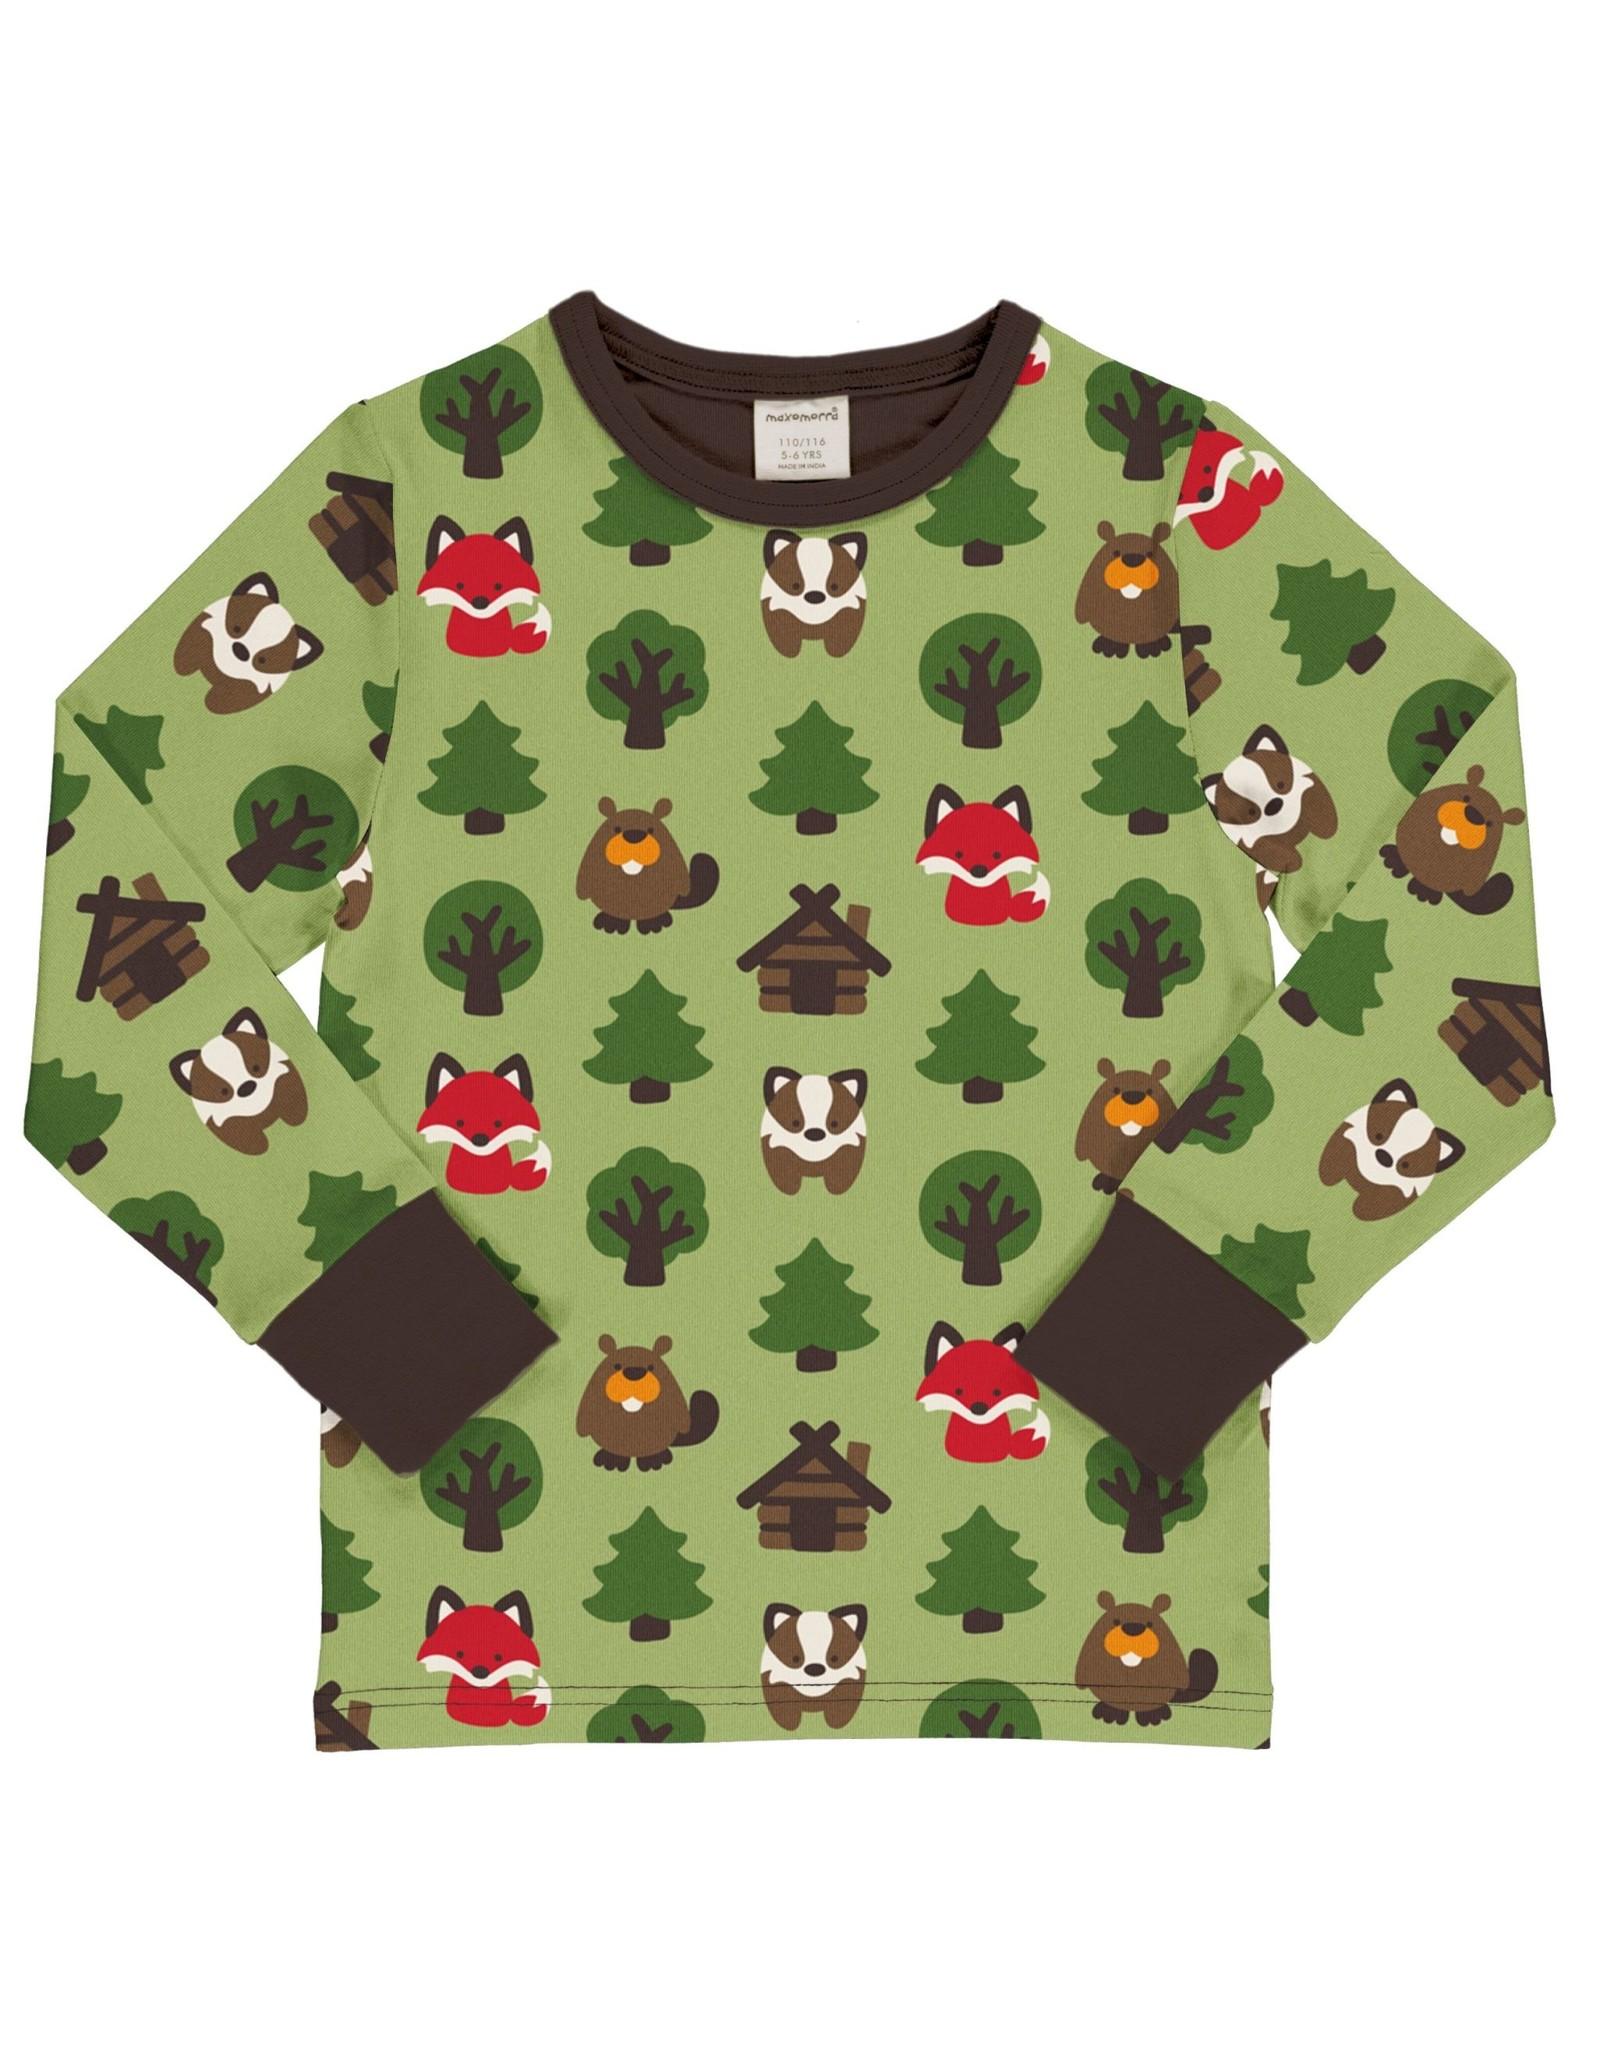 Maxomorra T-shirt met leuke printjes uit het bos